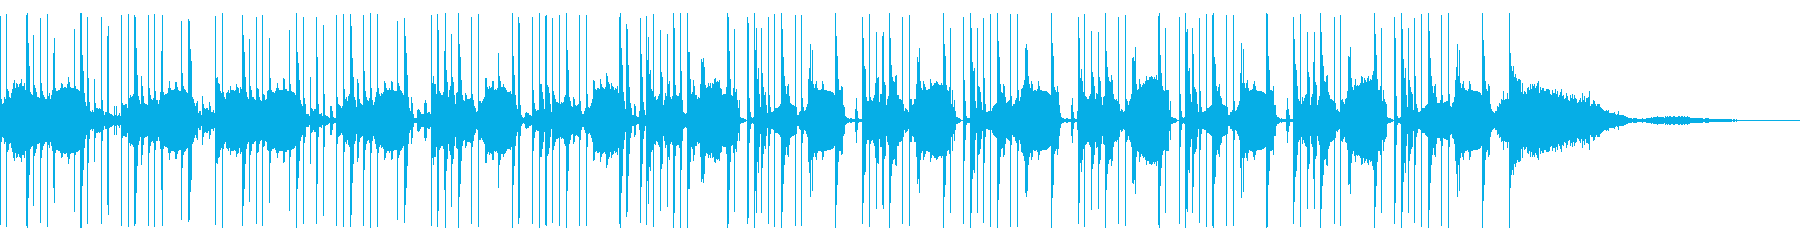 119 BPMの再生済みの波形